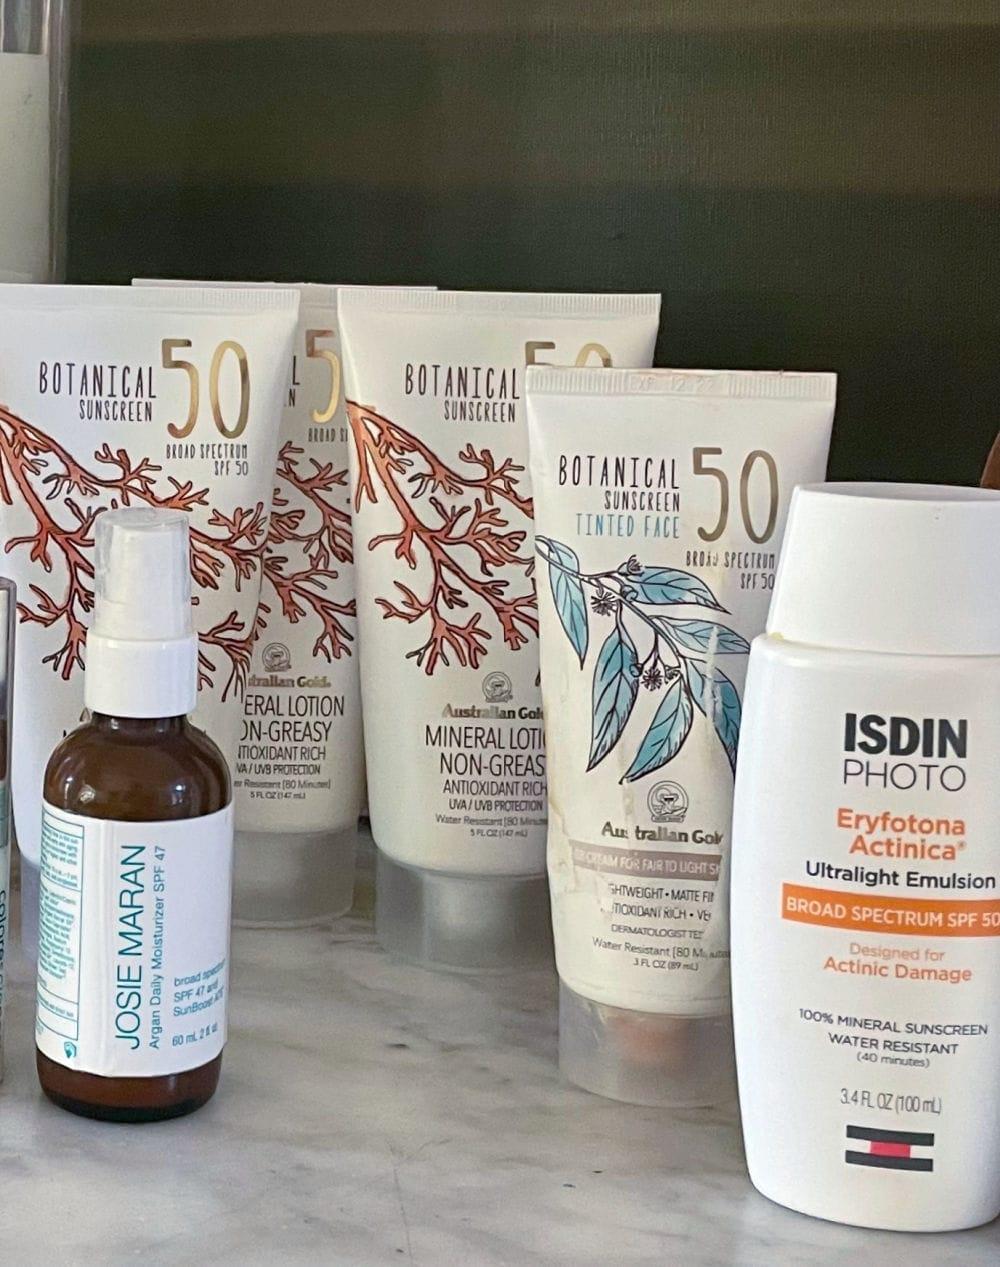 3 tubes of australian gold cruelty free sunscreen